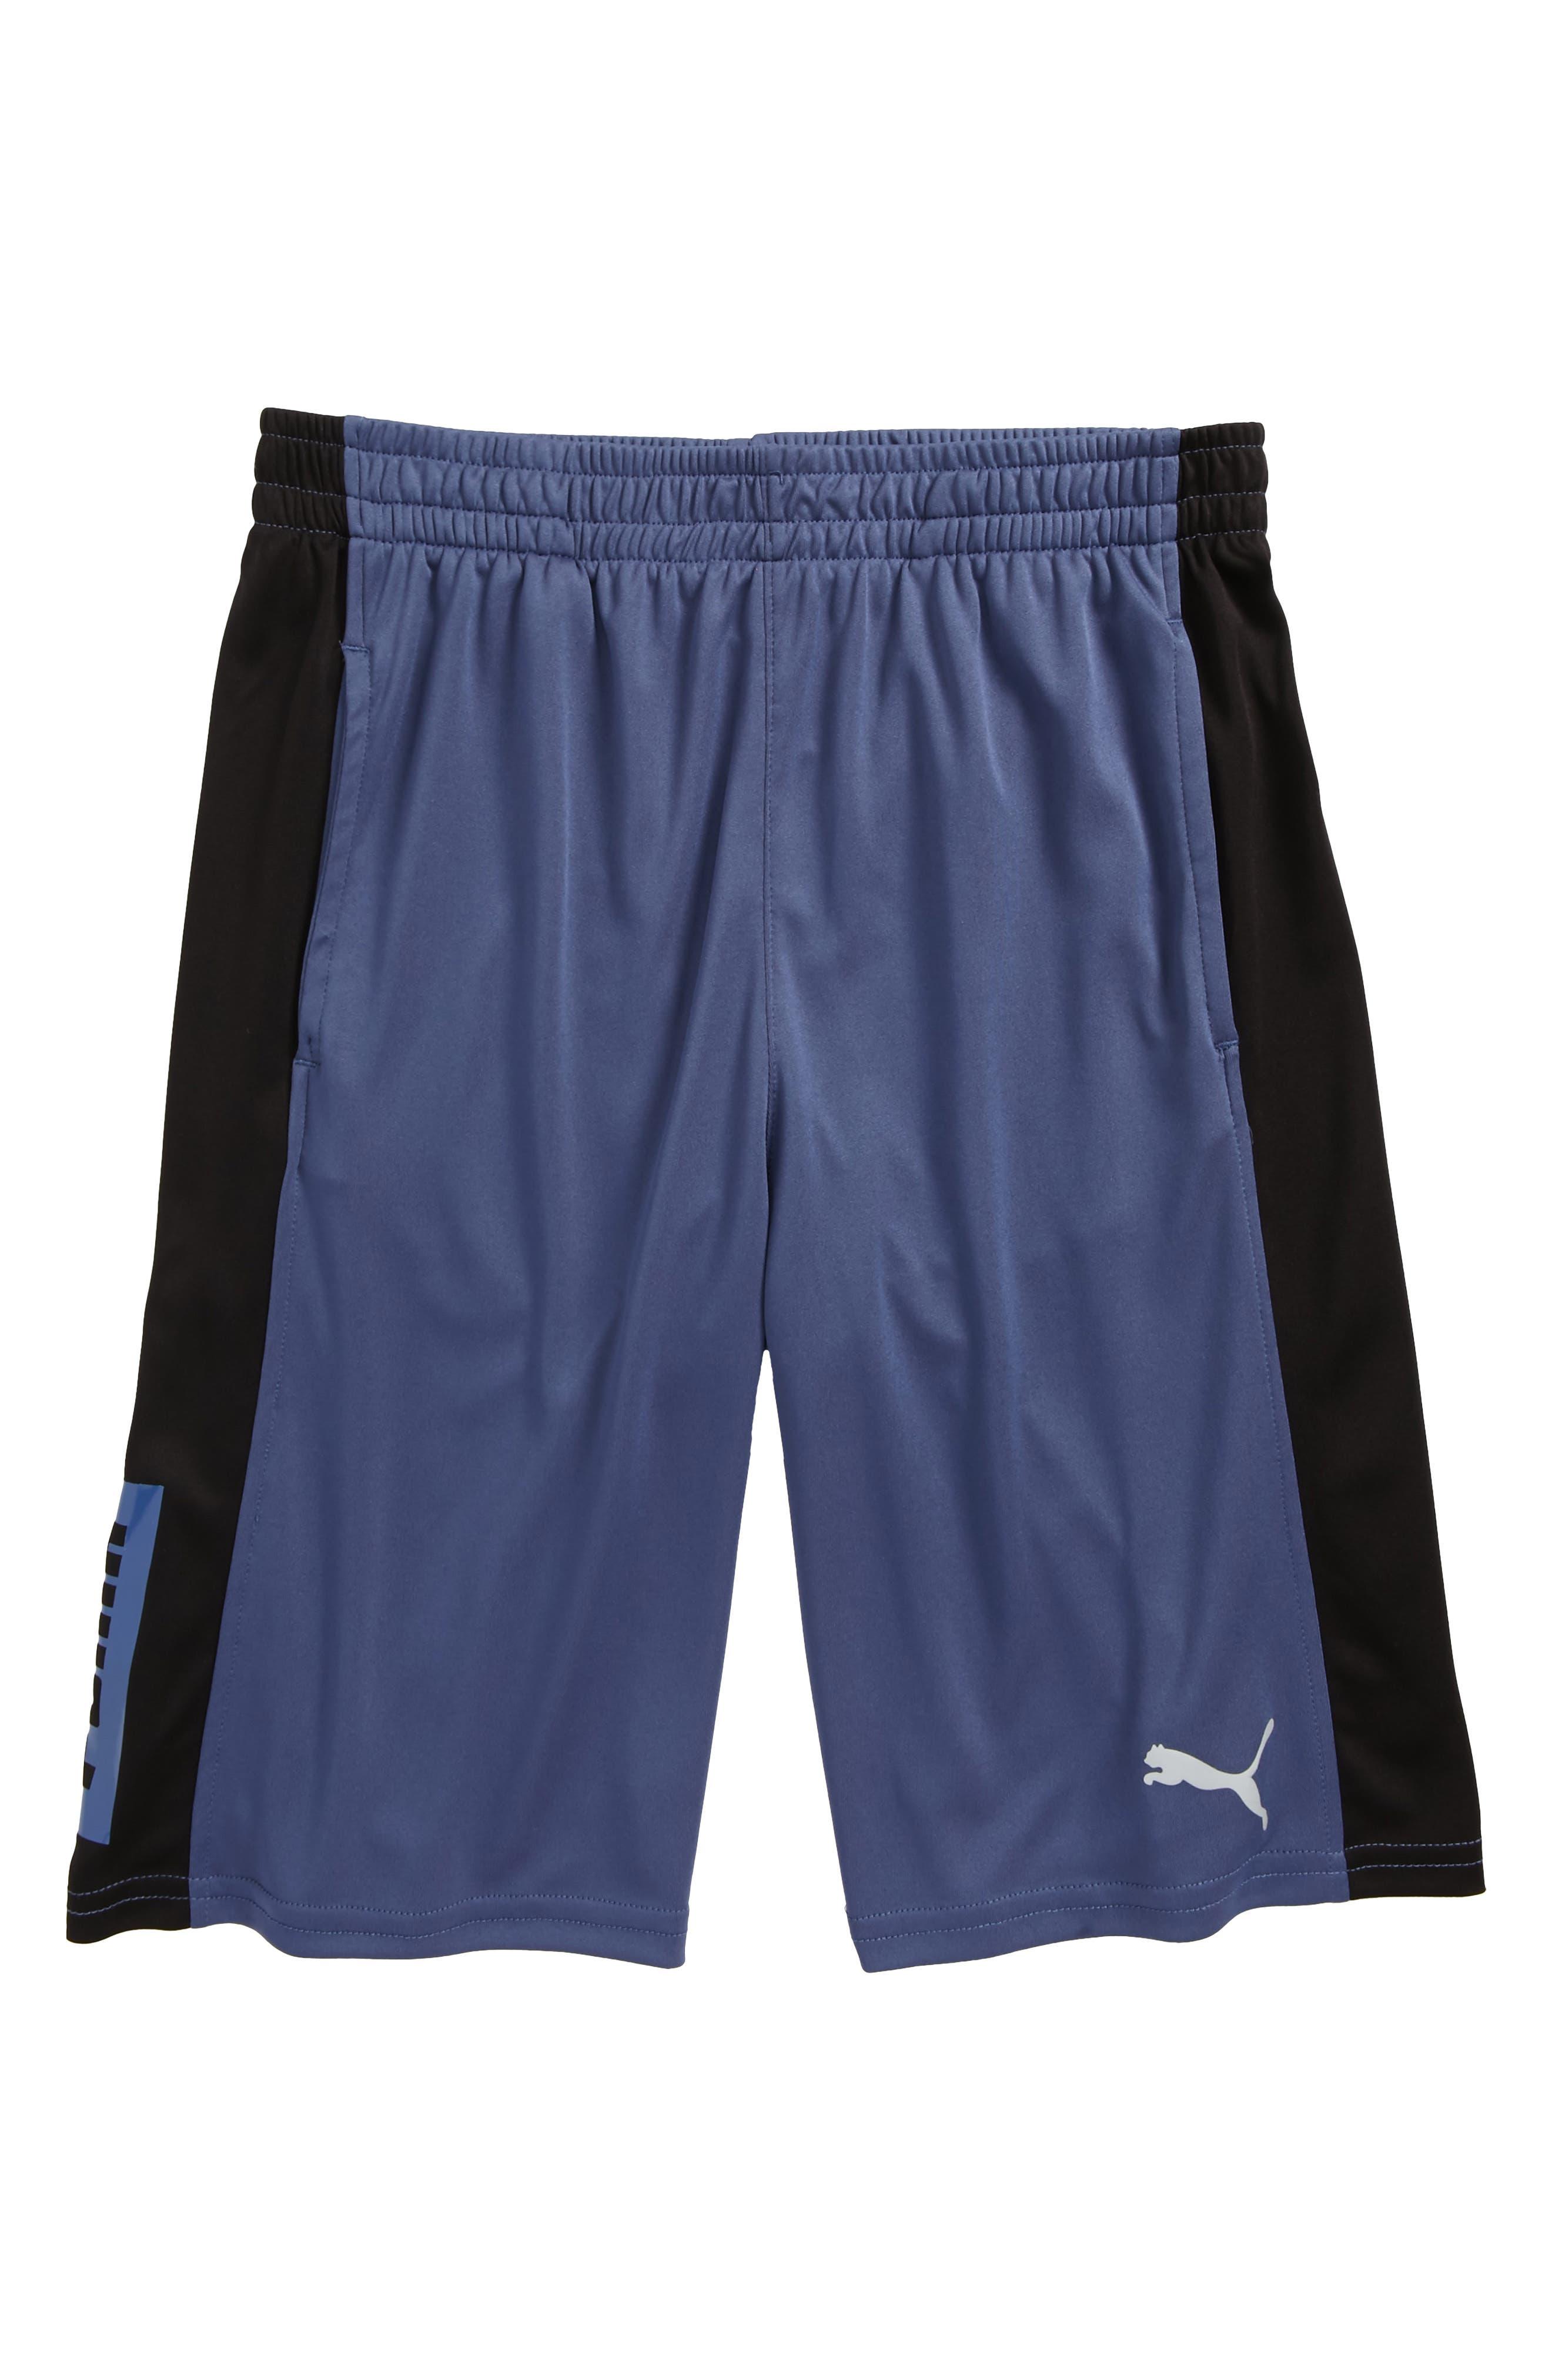 PUMA Colorblock Perforated Shorts (Big Boys)